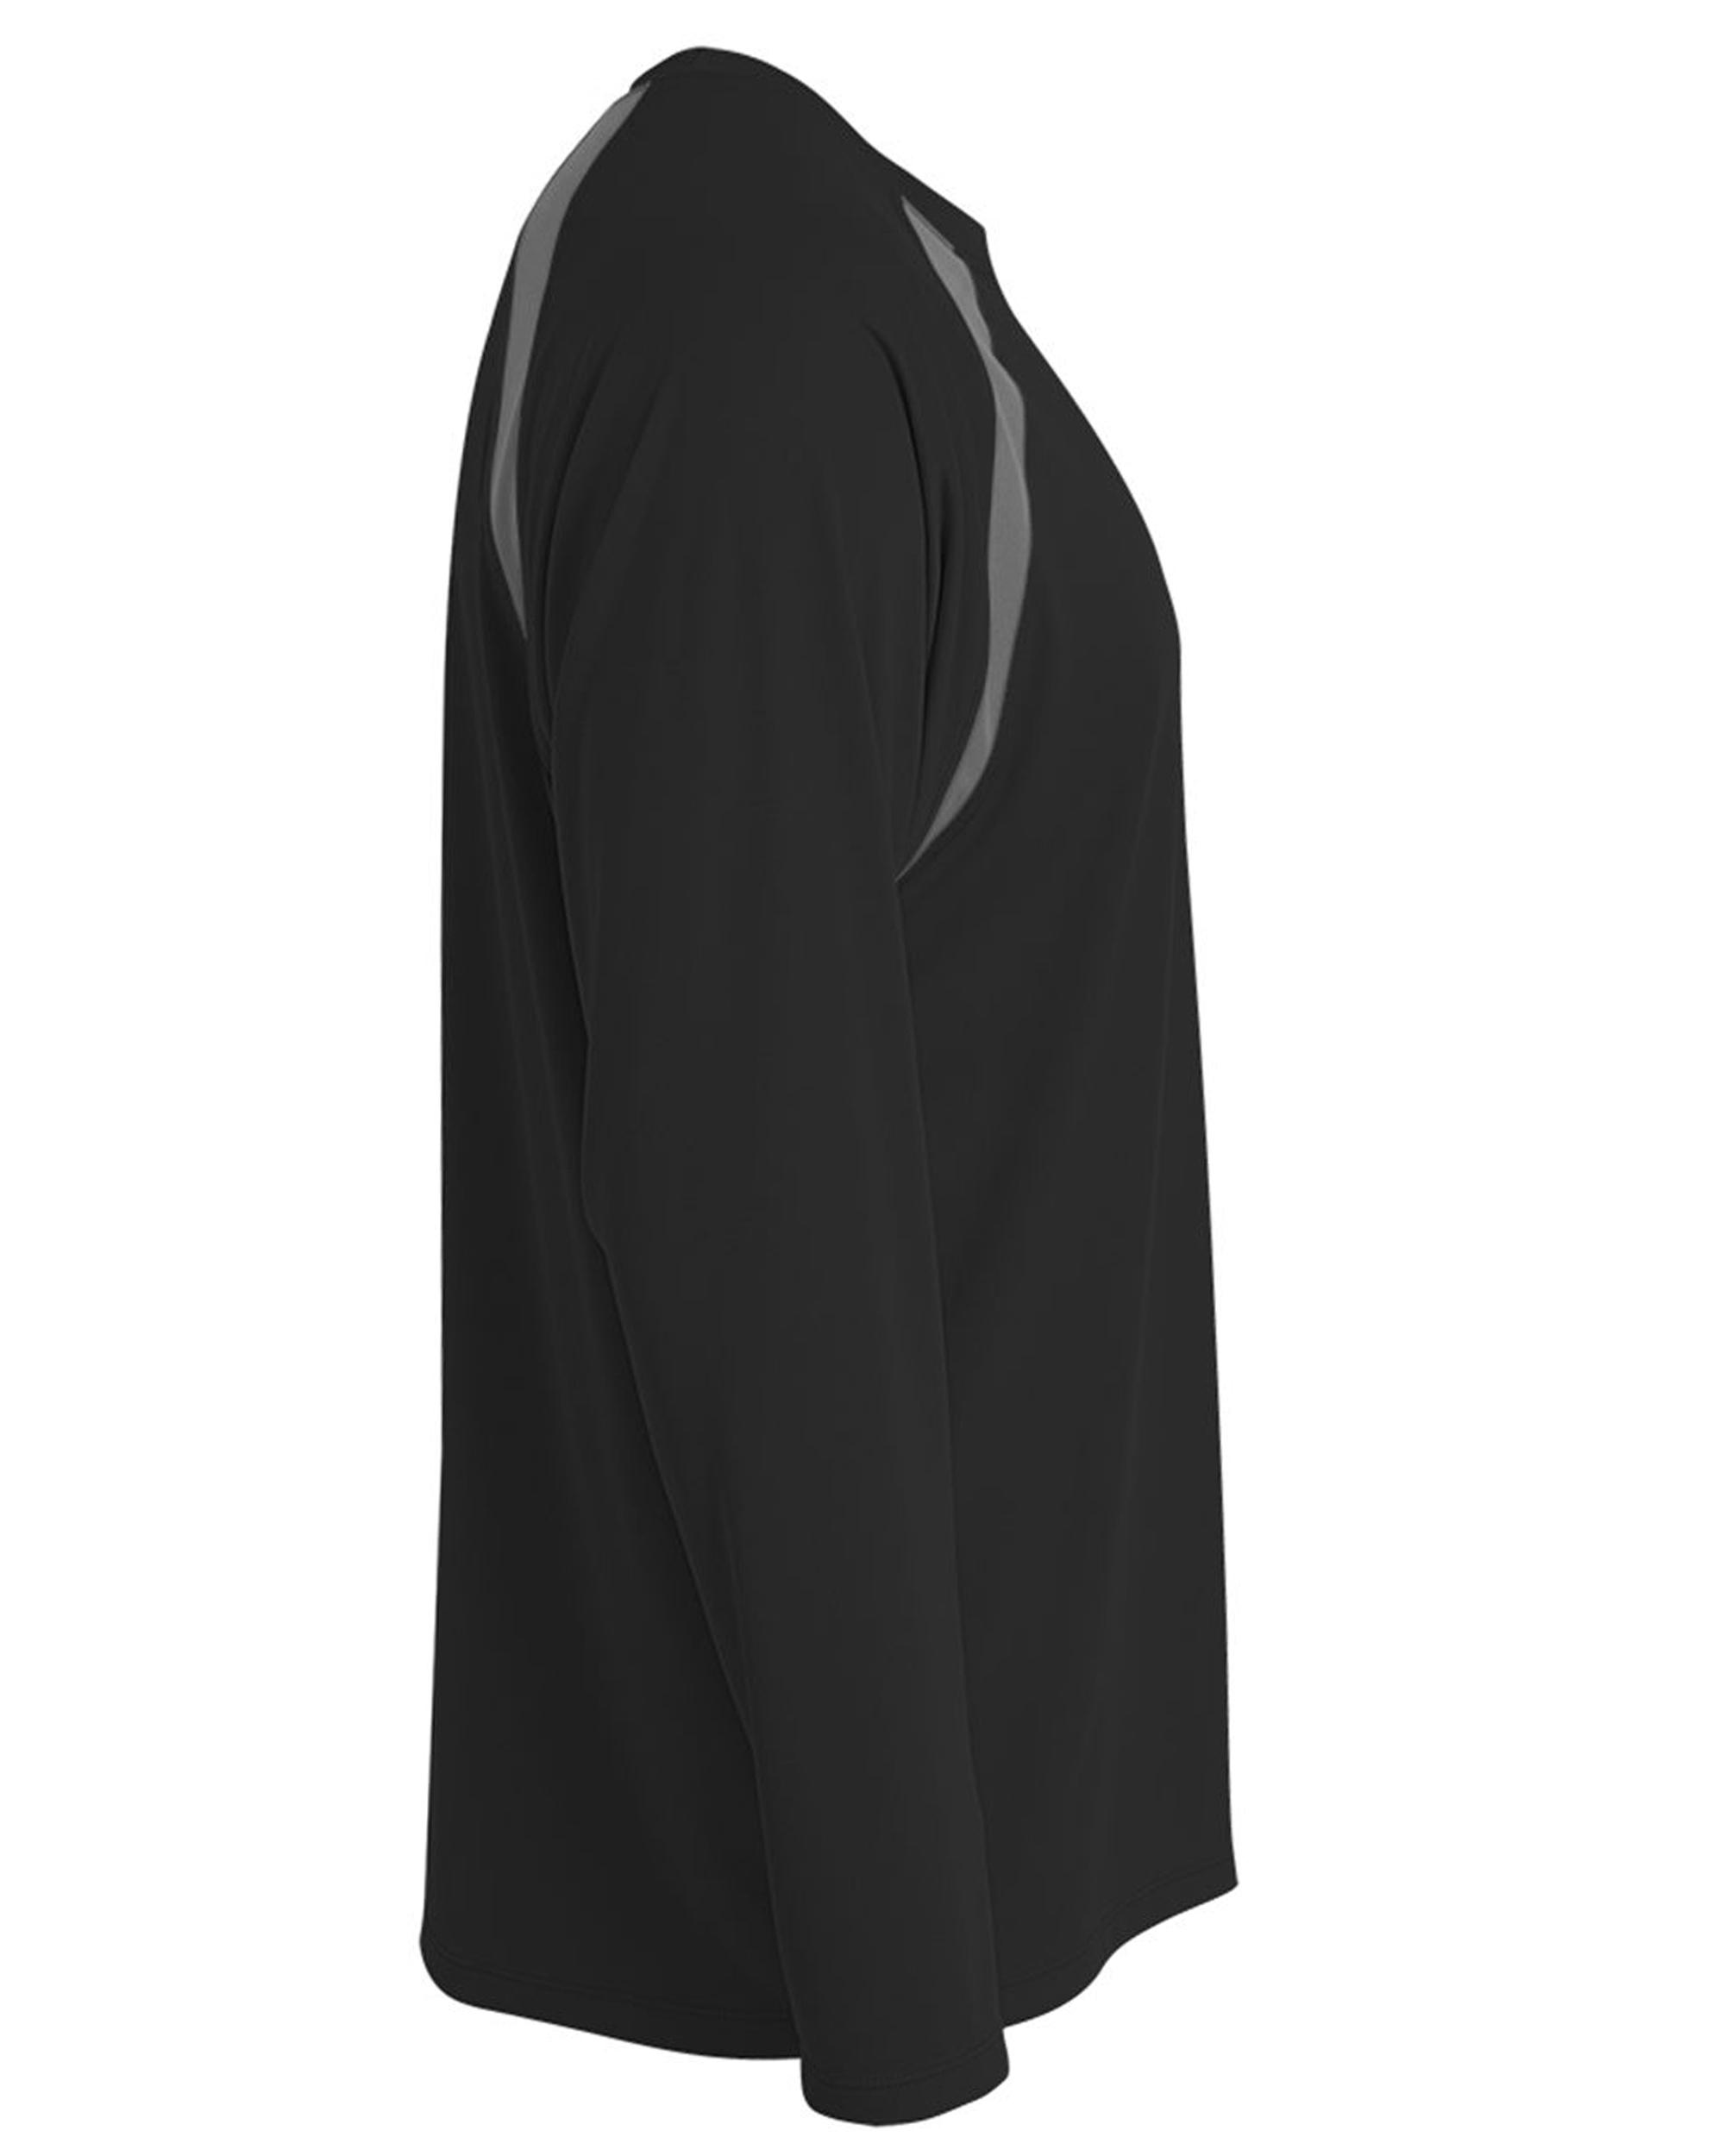 Men-039-s-Long-Sleeve-Loose-Fit-Rash-Guard-Surf-Shirt-Water-Sports-Swimwear thumbnail 7